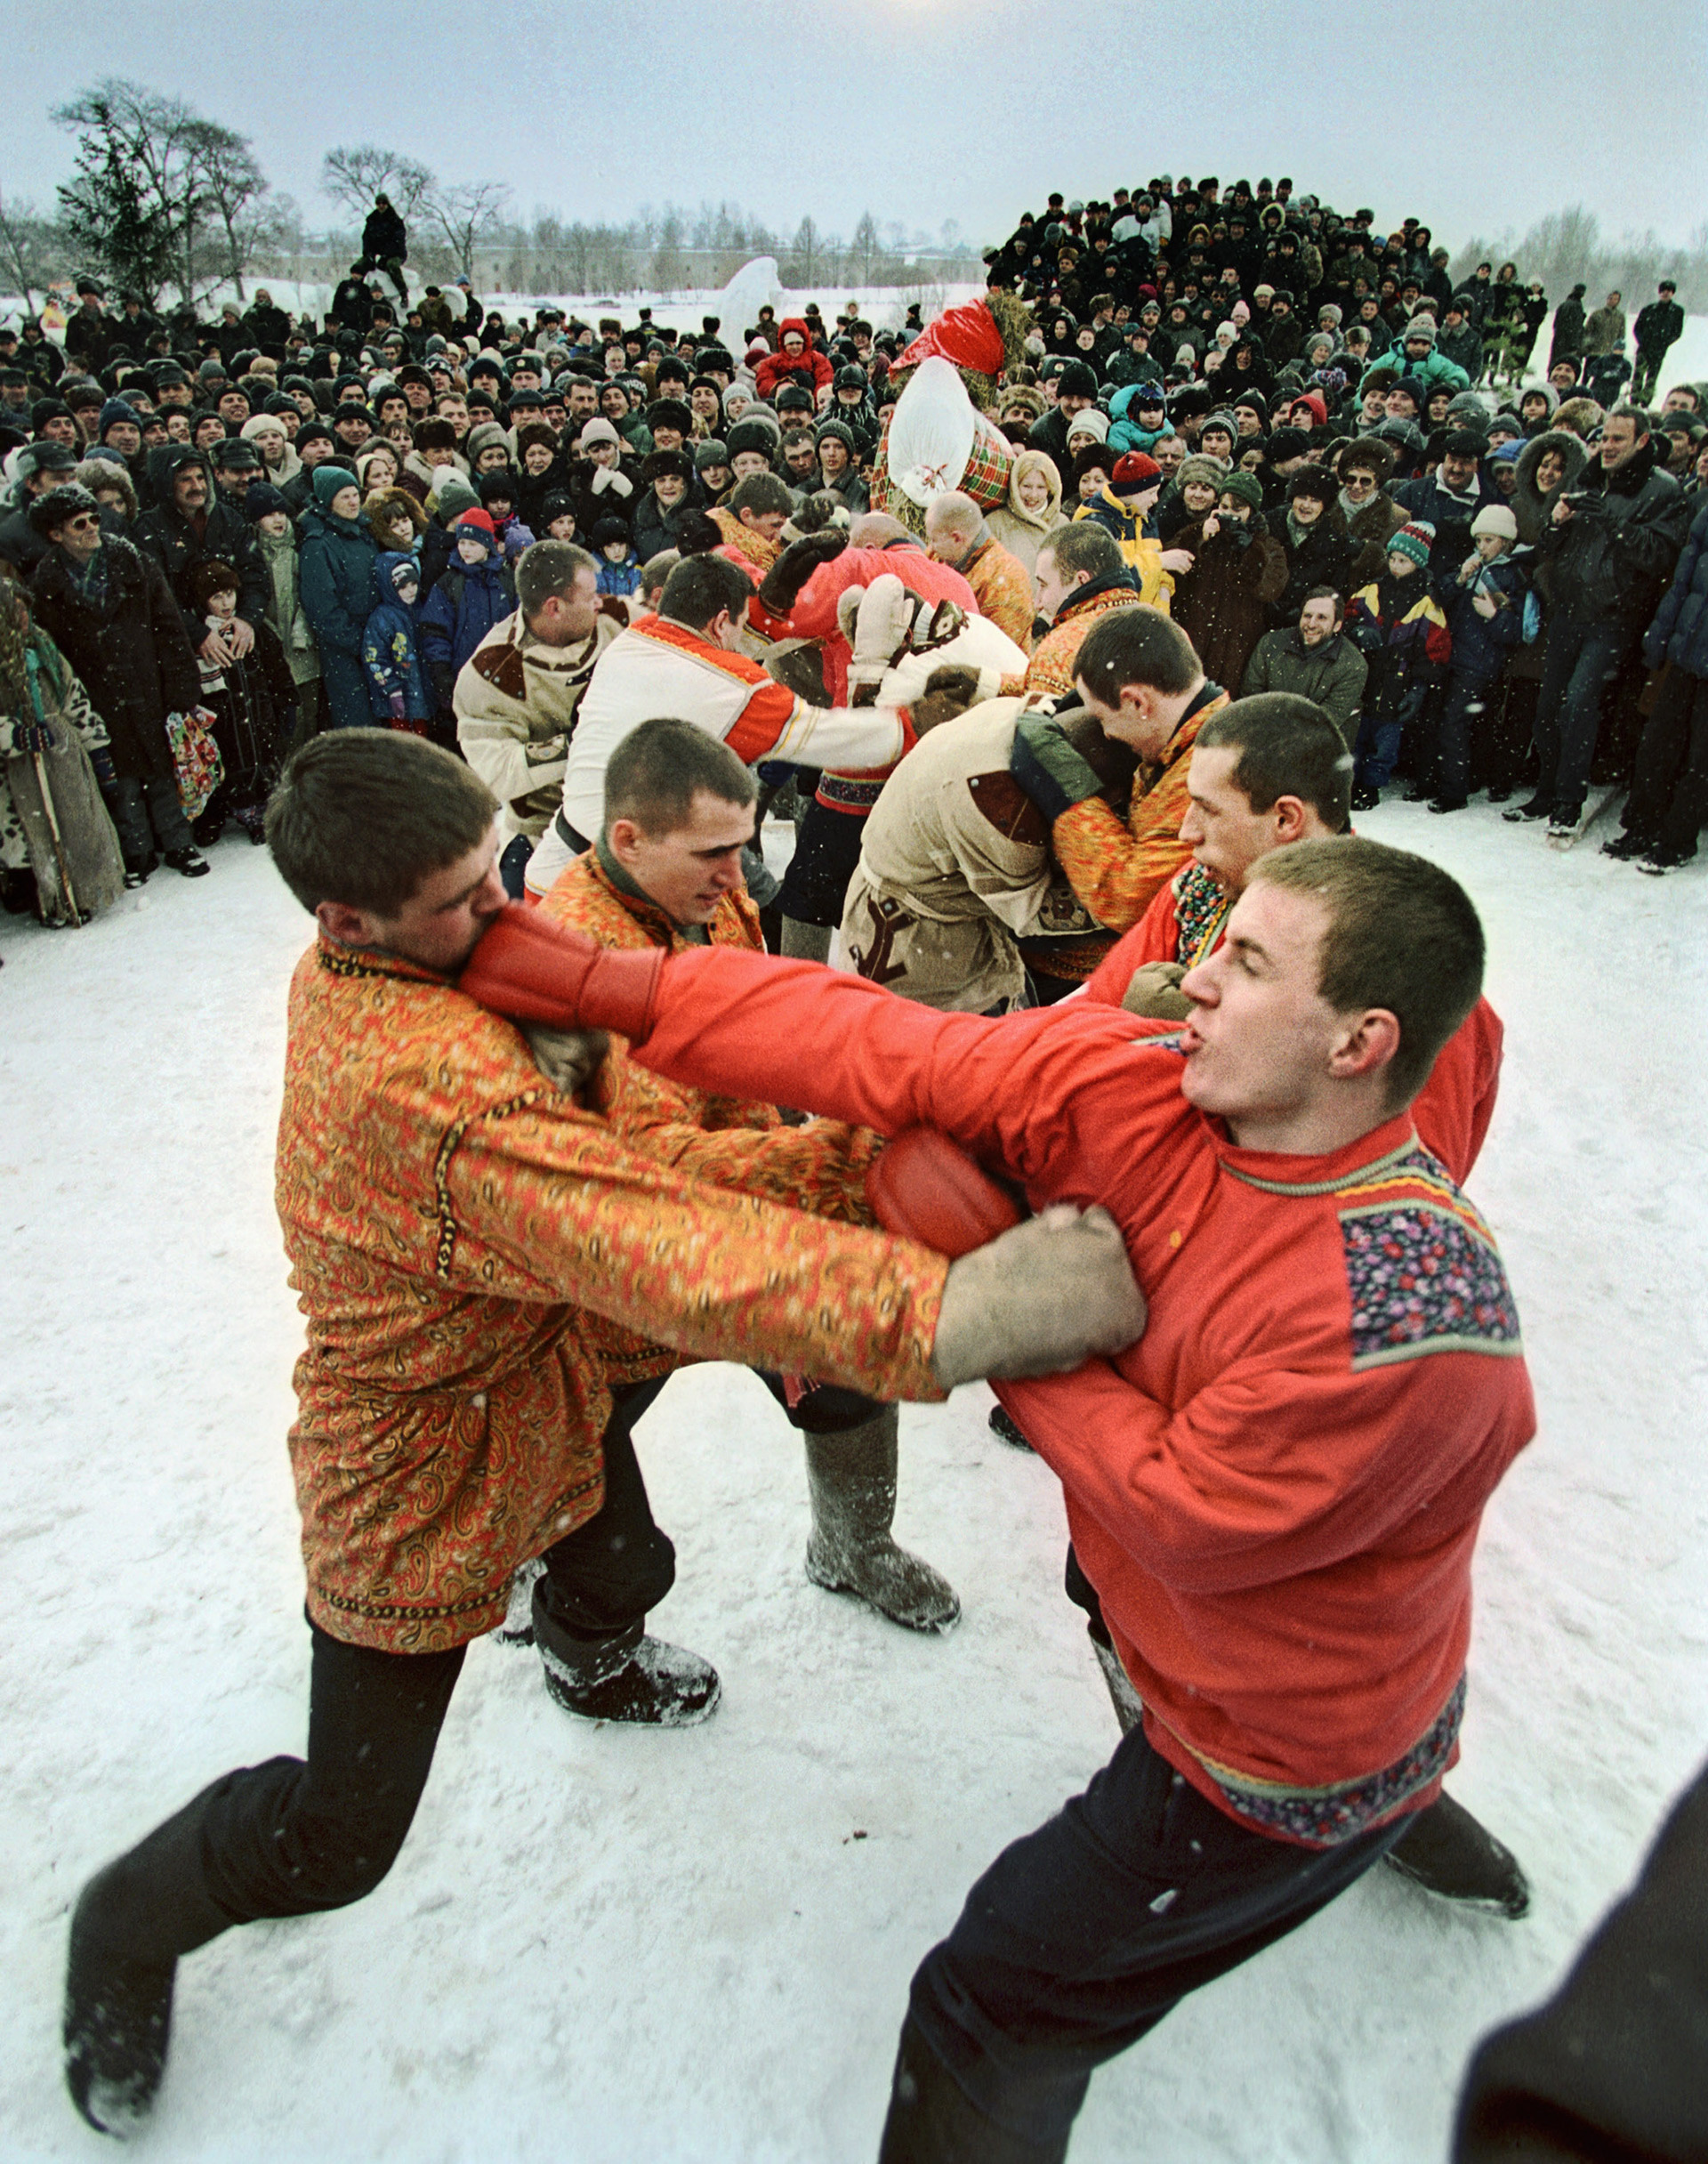 Традиционен юмручен бой по време на празник в Суздал.